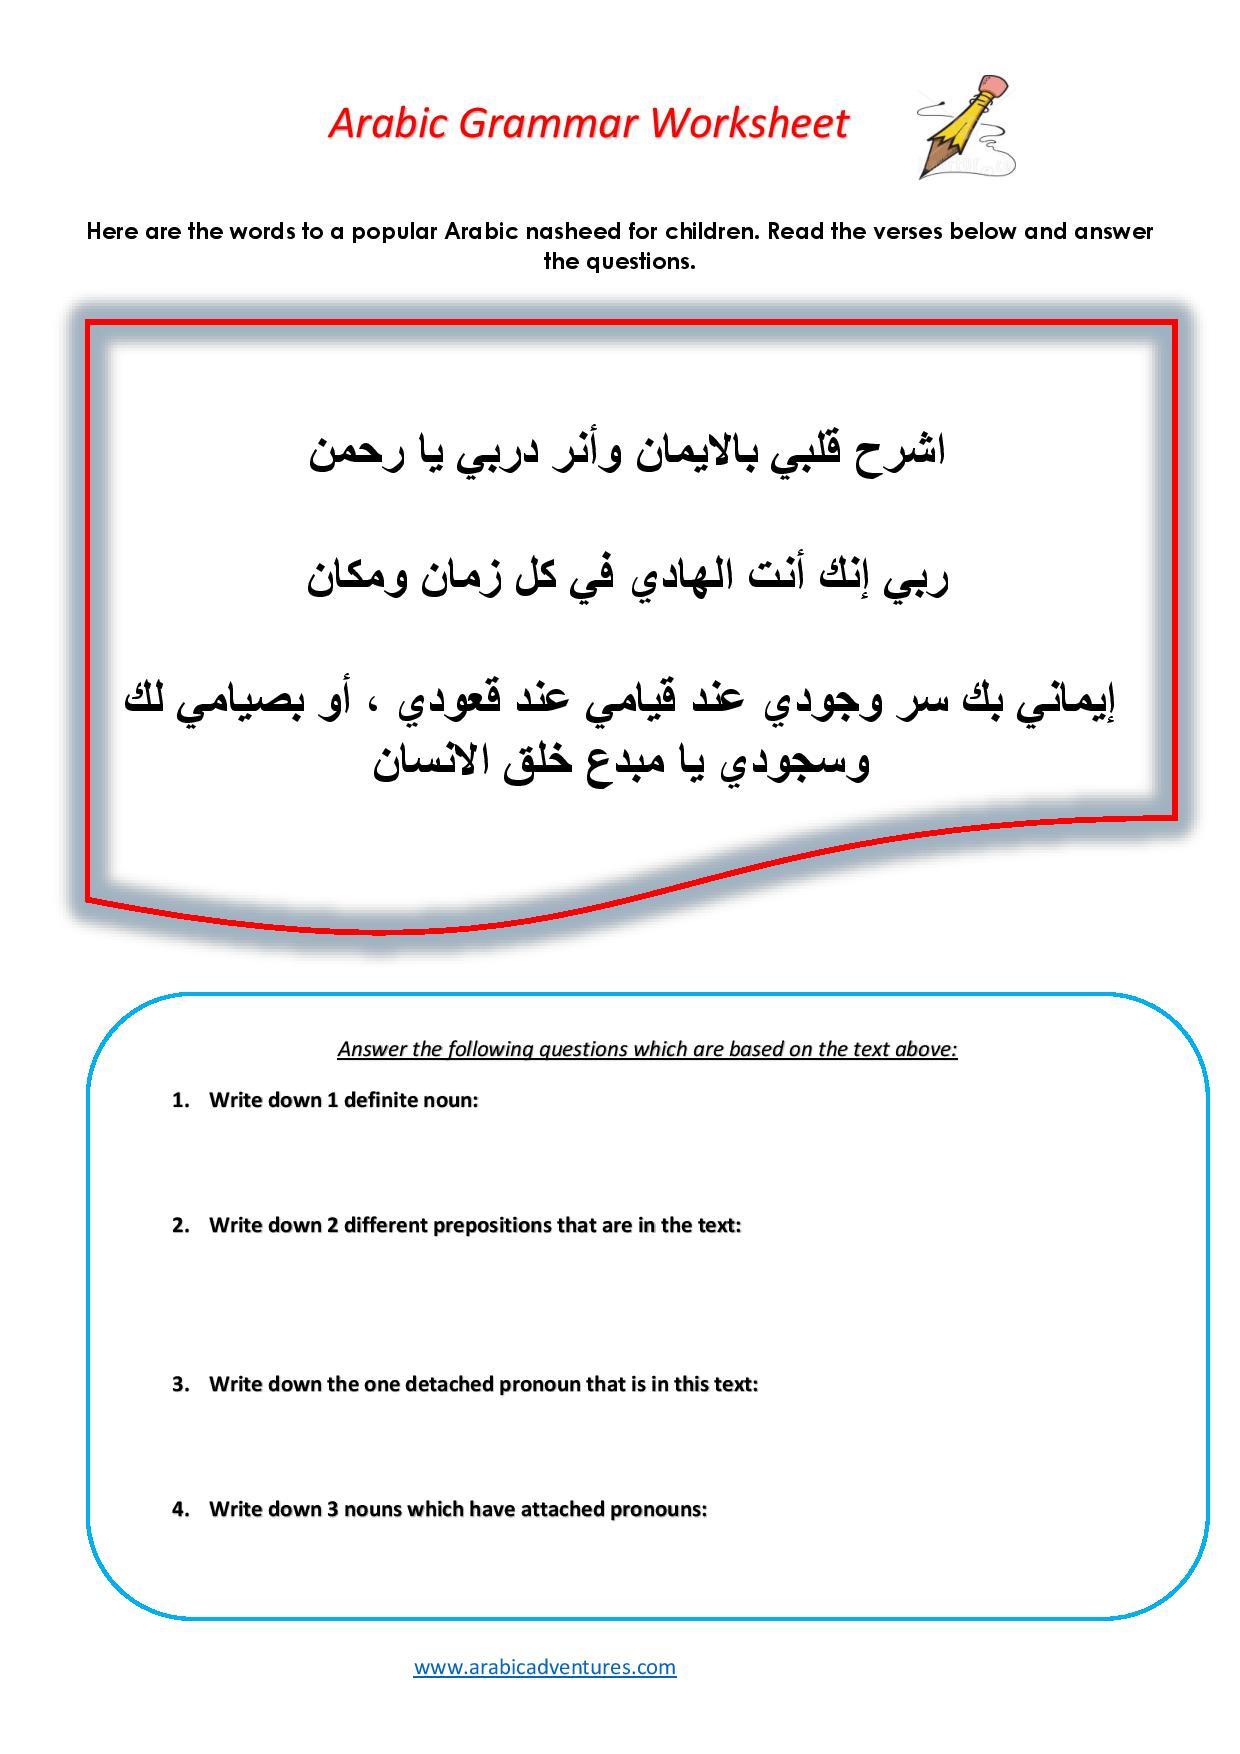 Arabic Grammar Worksheet